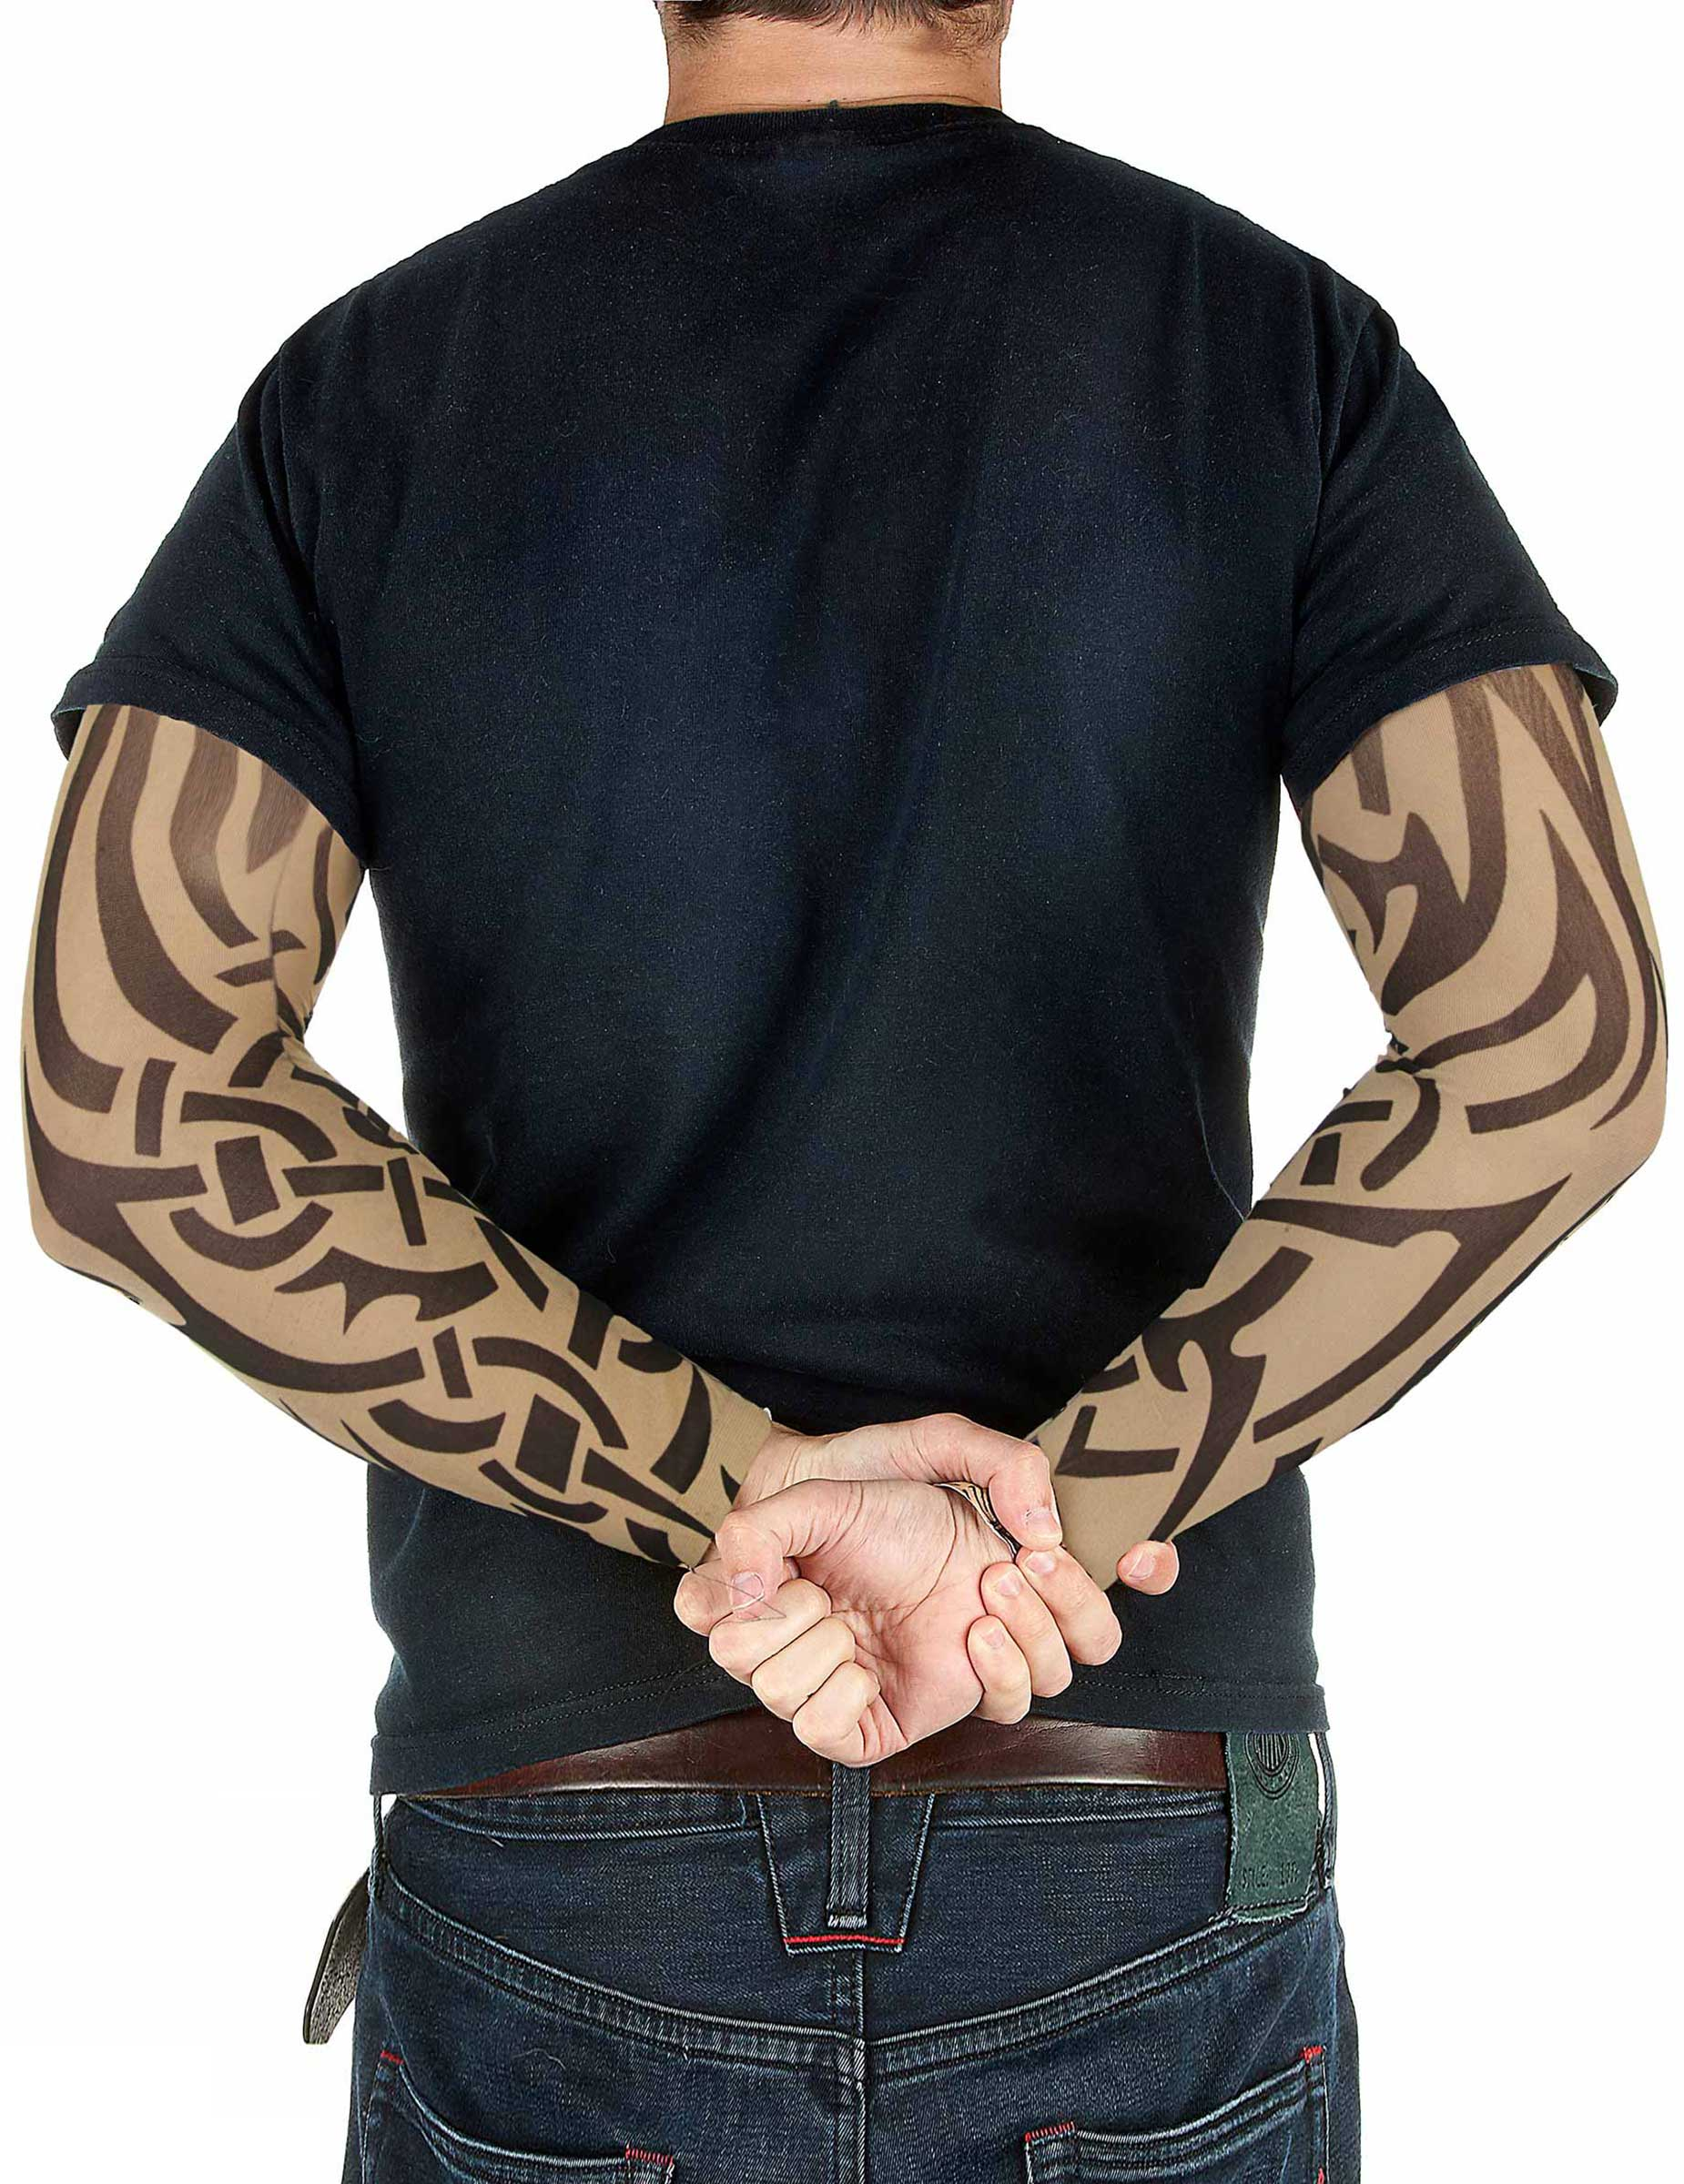 tattoo rmel rocker biker bunt g nstige faschings accessoires zubeh r bei karneval megastore. Black Bedroom Furniture Sets. Home Design Ideas